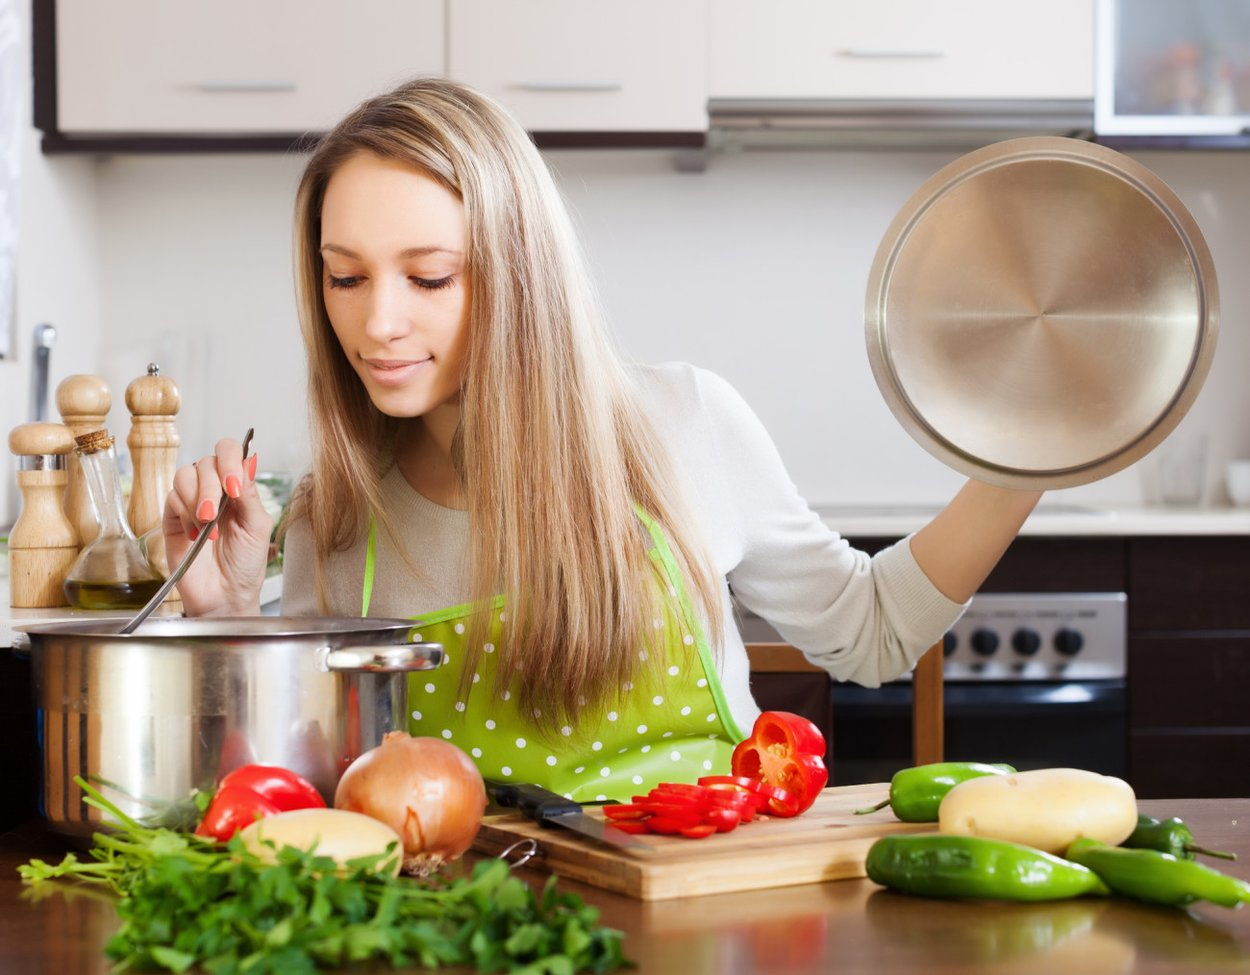 Kohlsuppe kochen